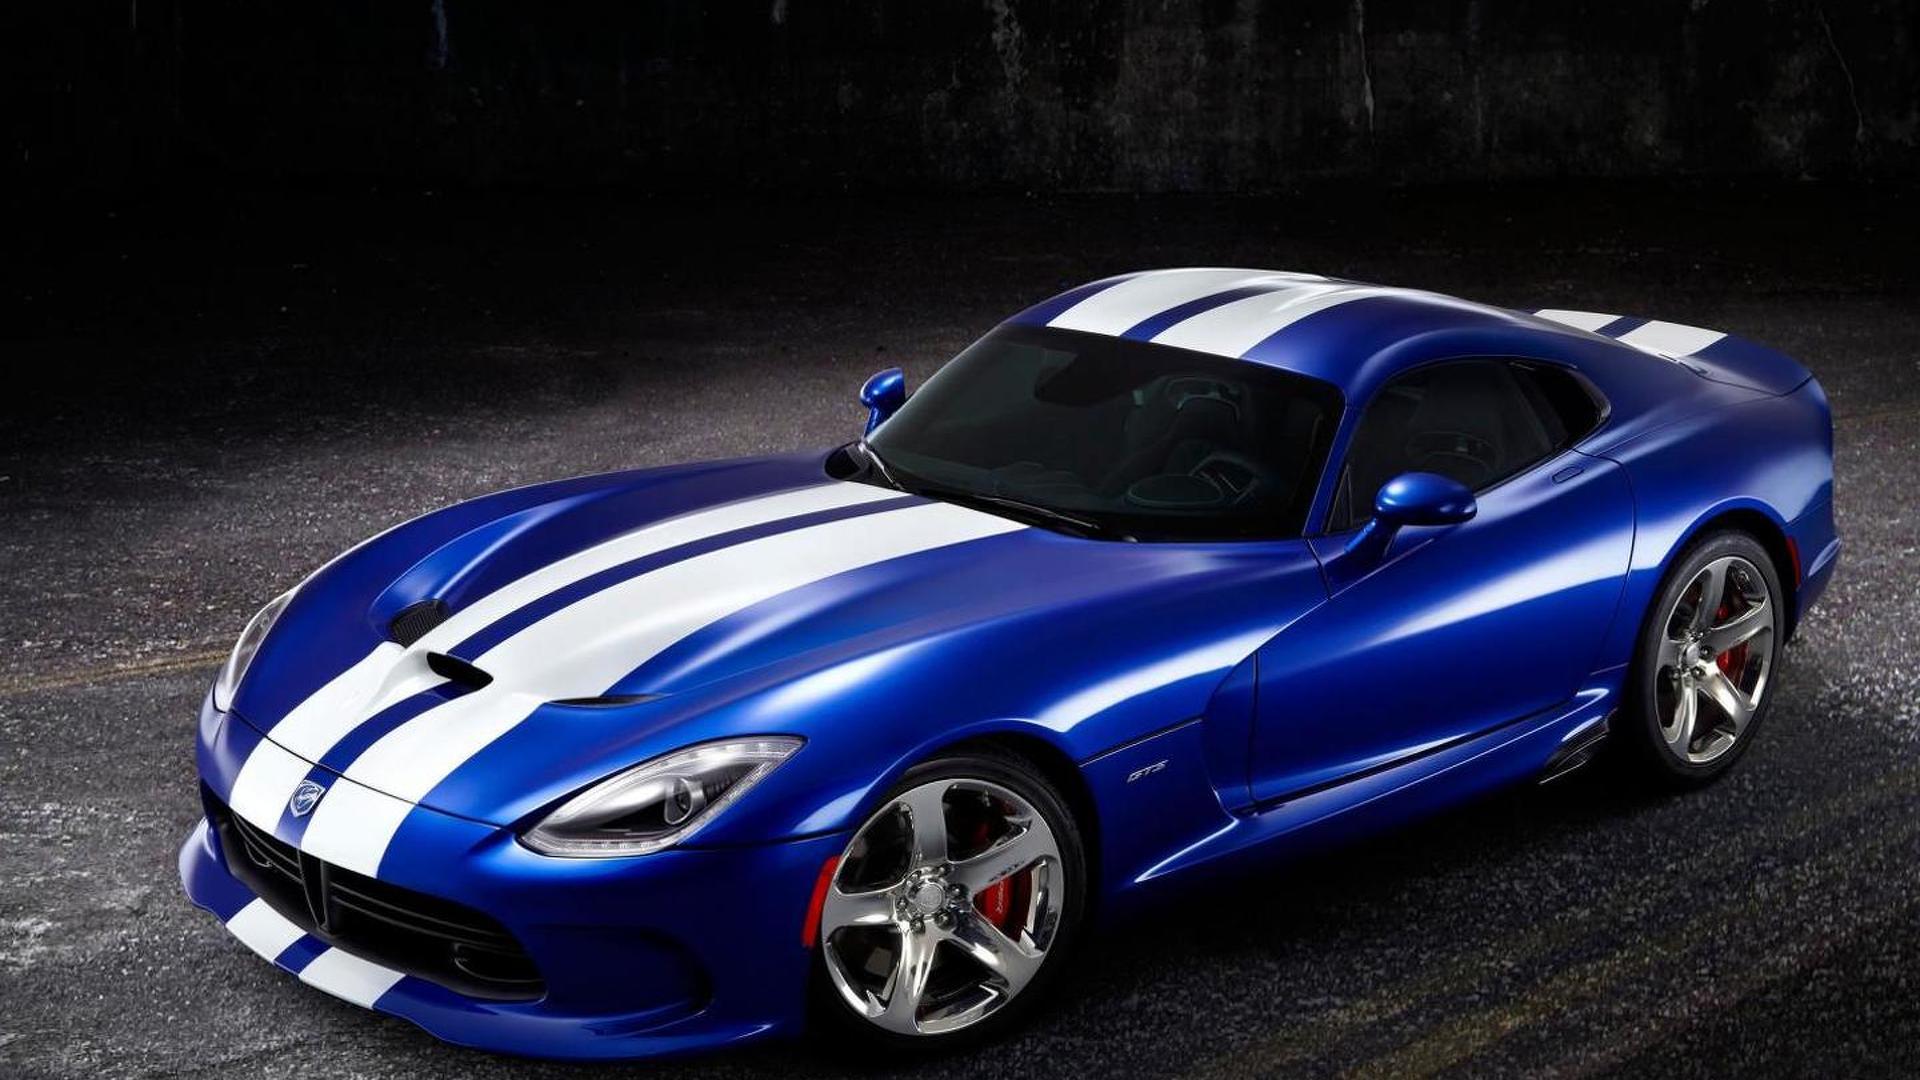 2013 SRT Viper GTS Launch Edition announced